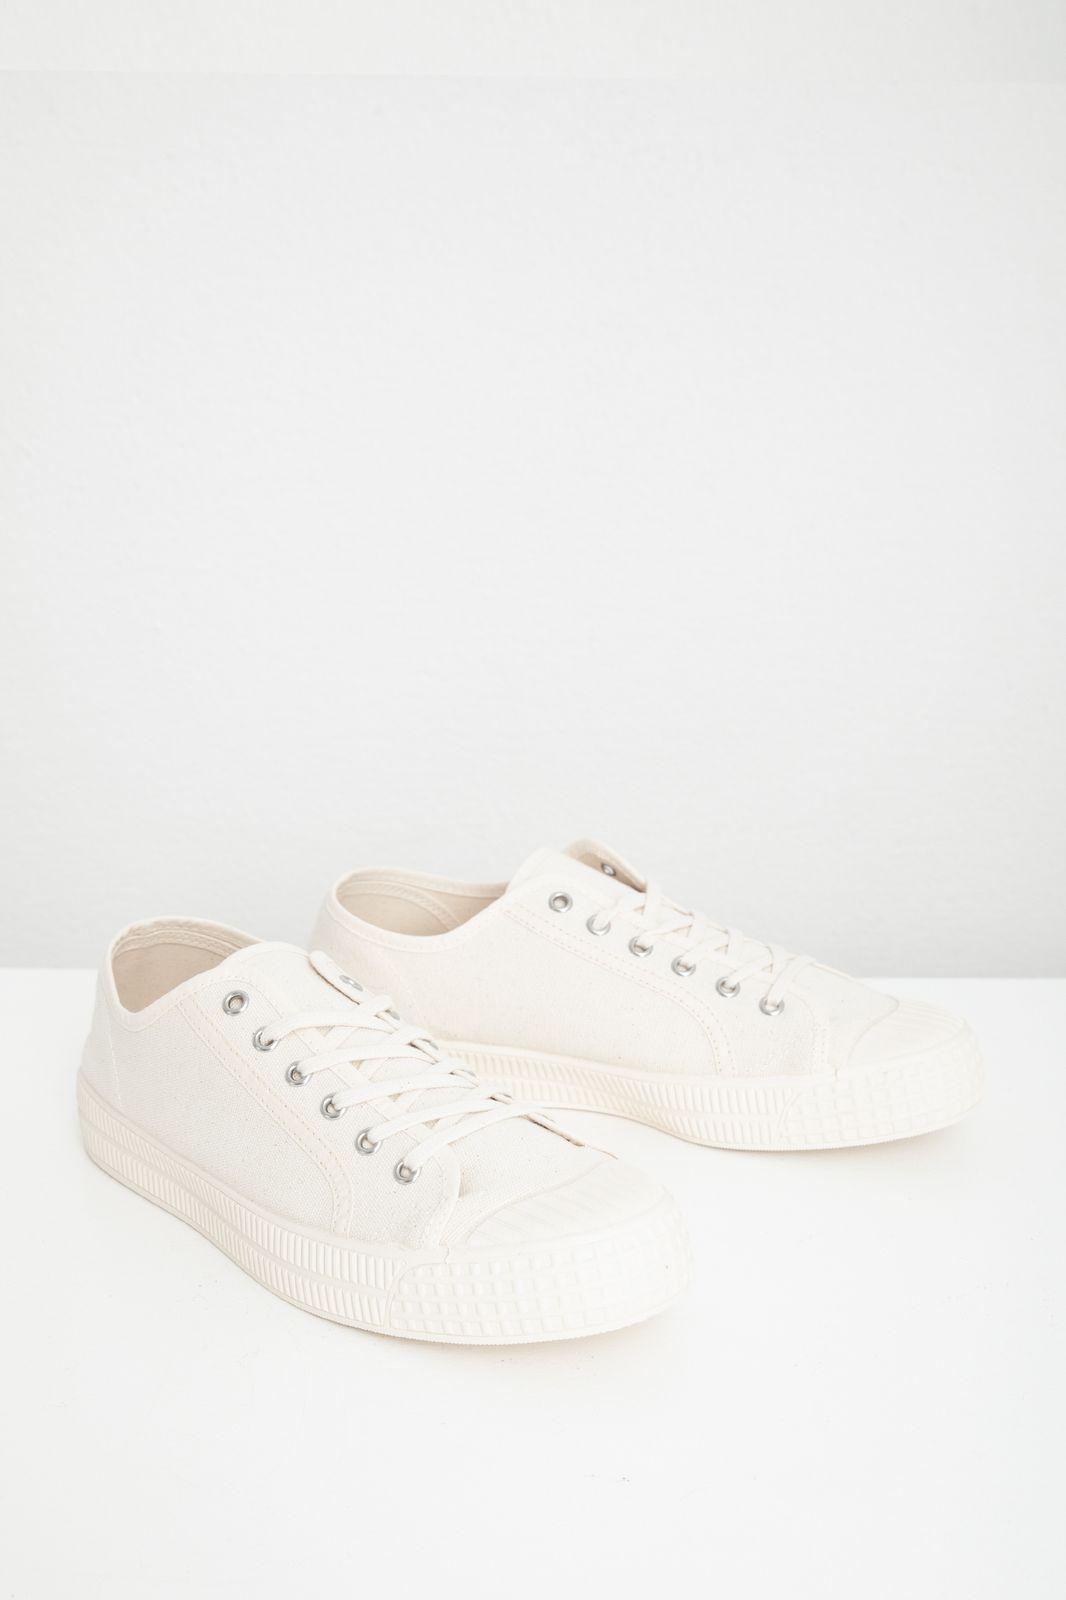 Lage witte canvas sneaker - Heren | Sissy-Boy